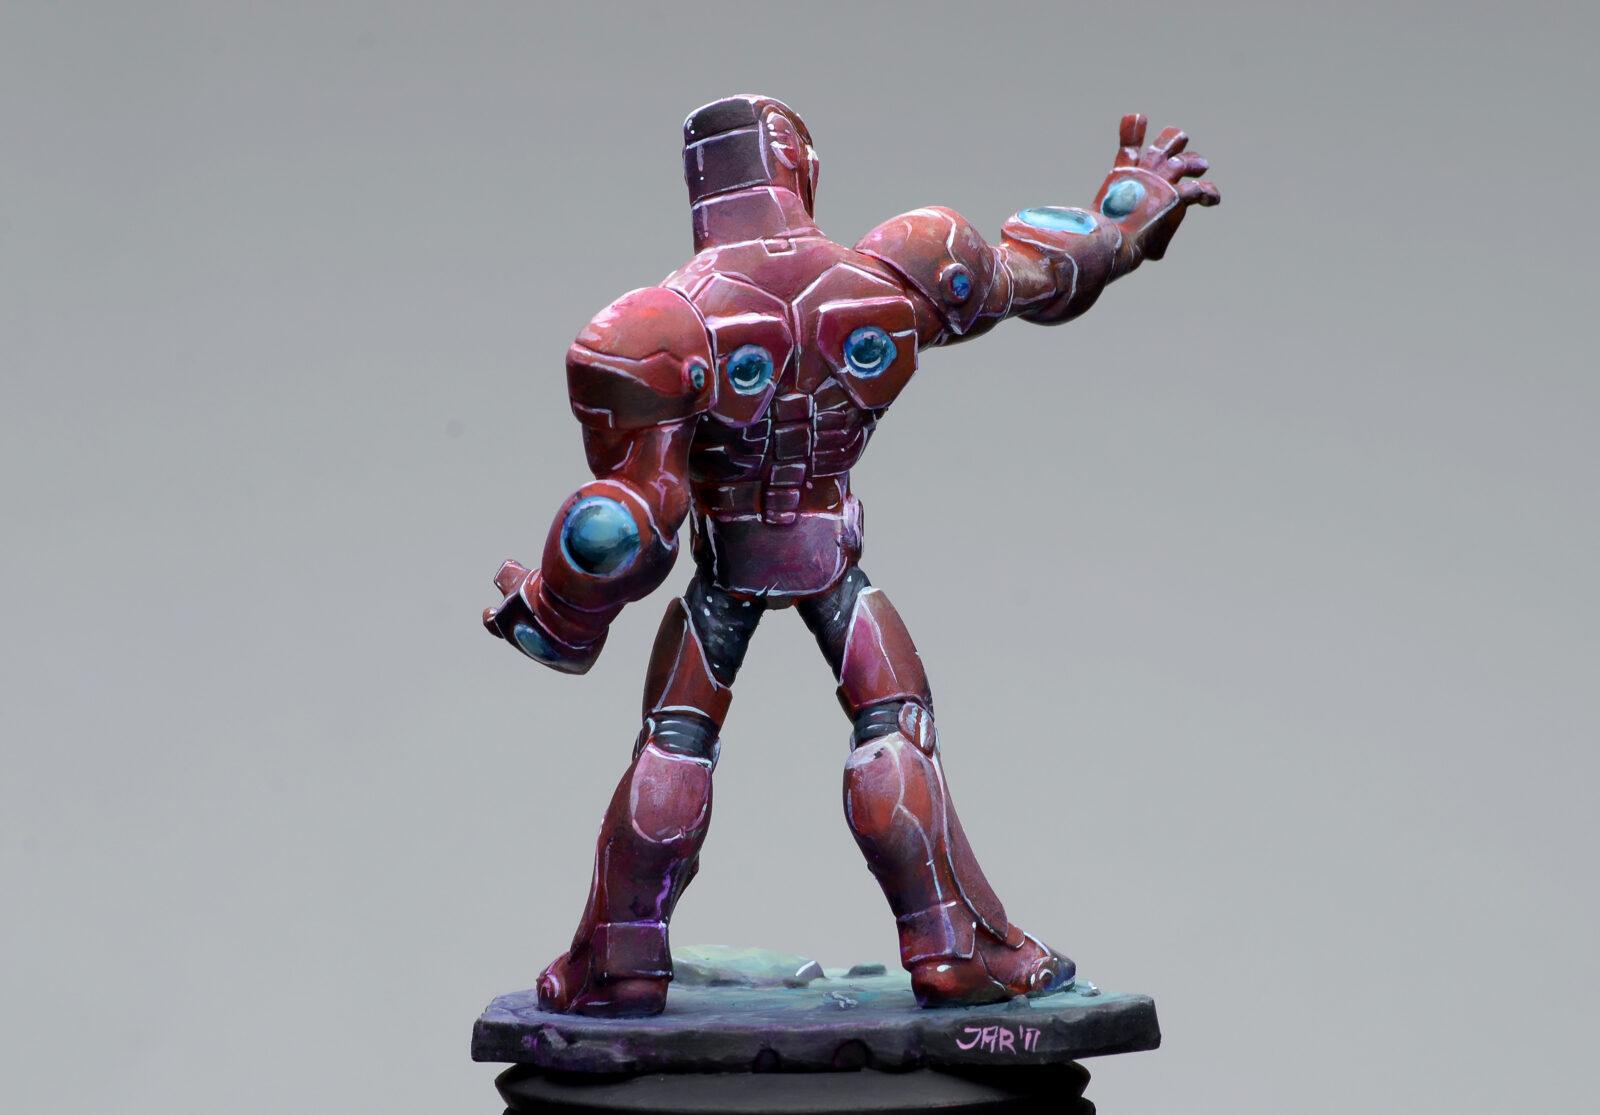 Ironman09